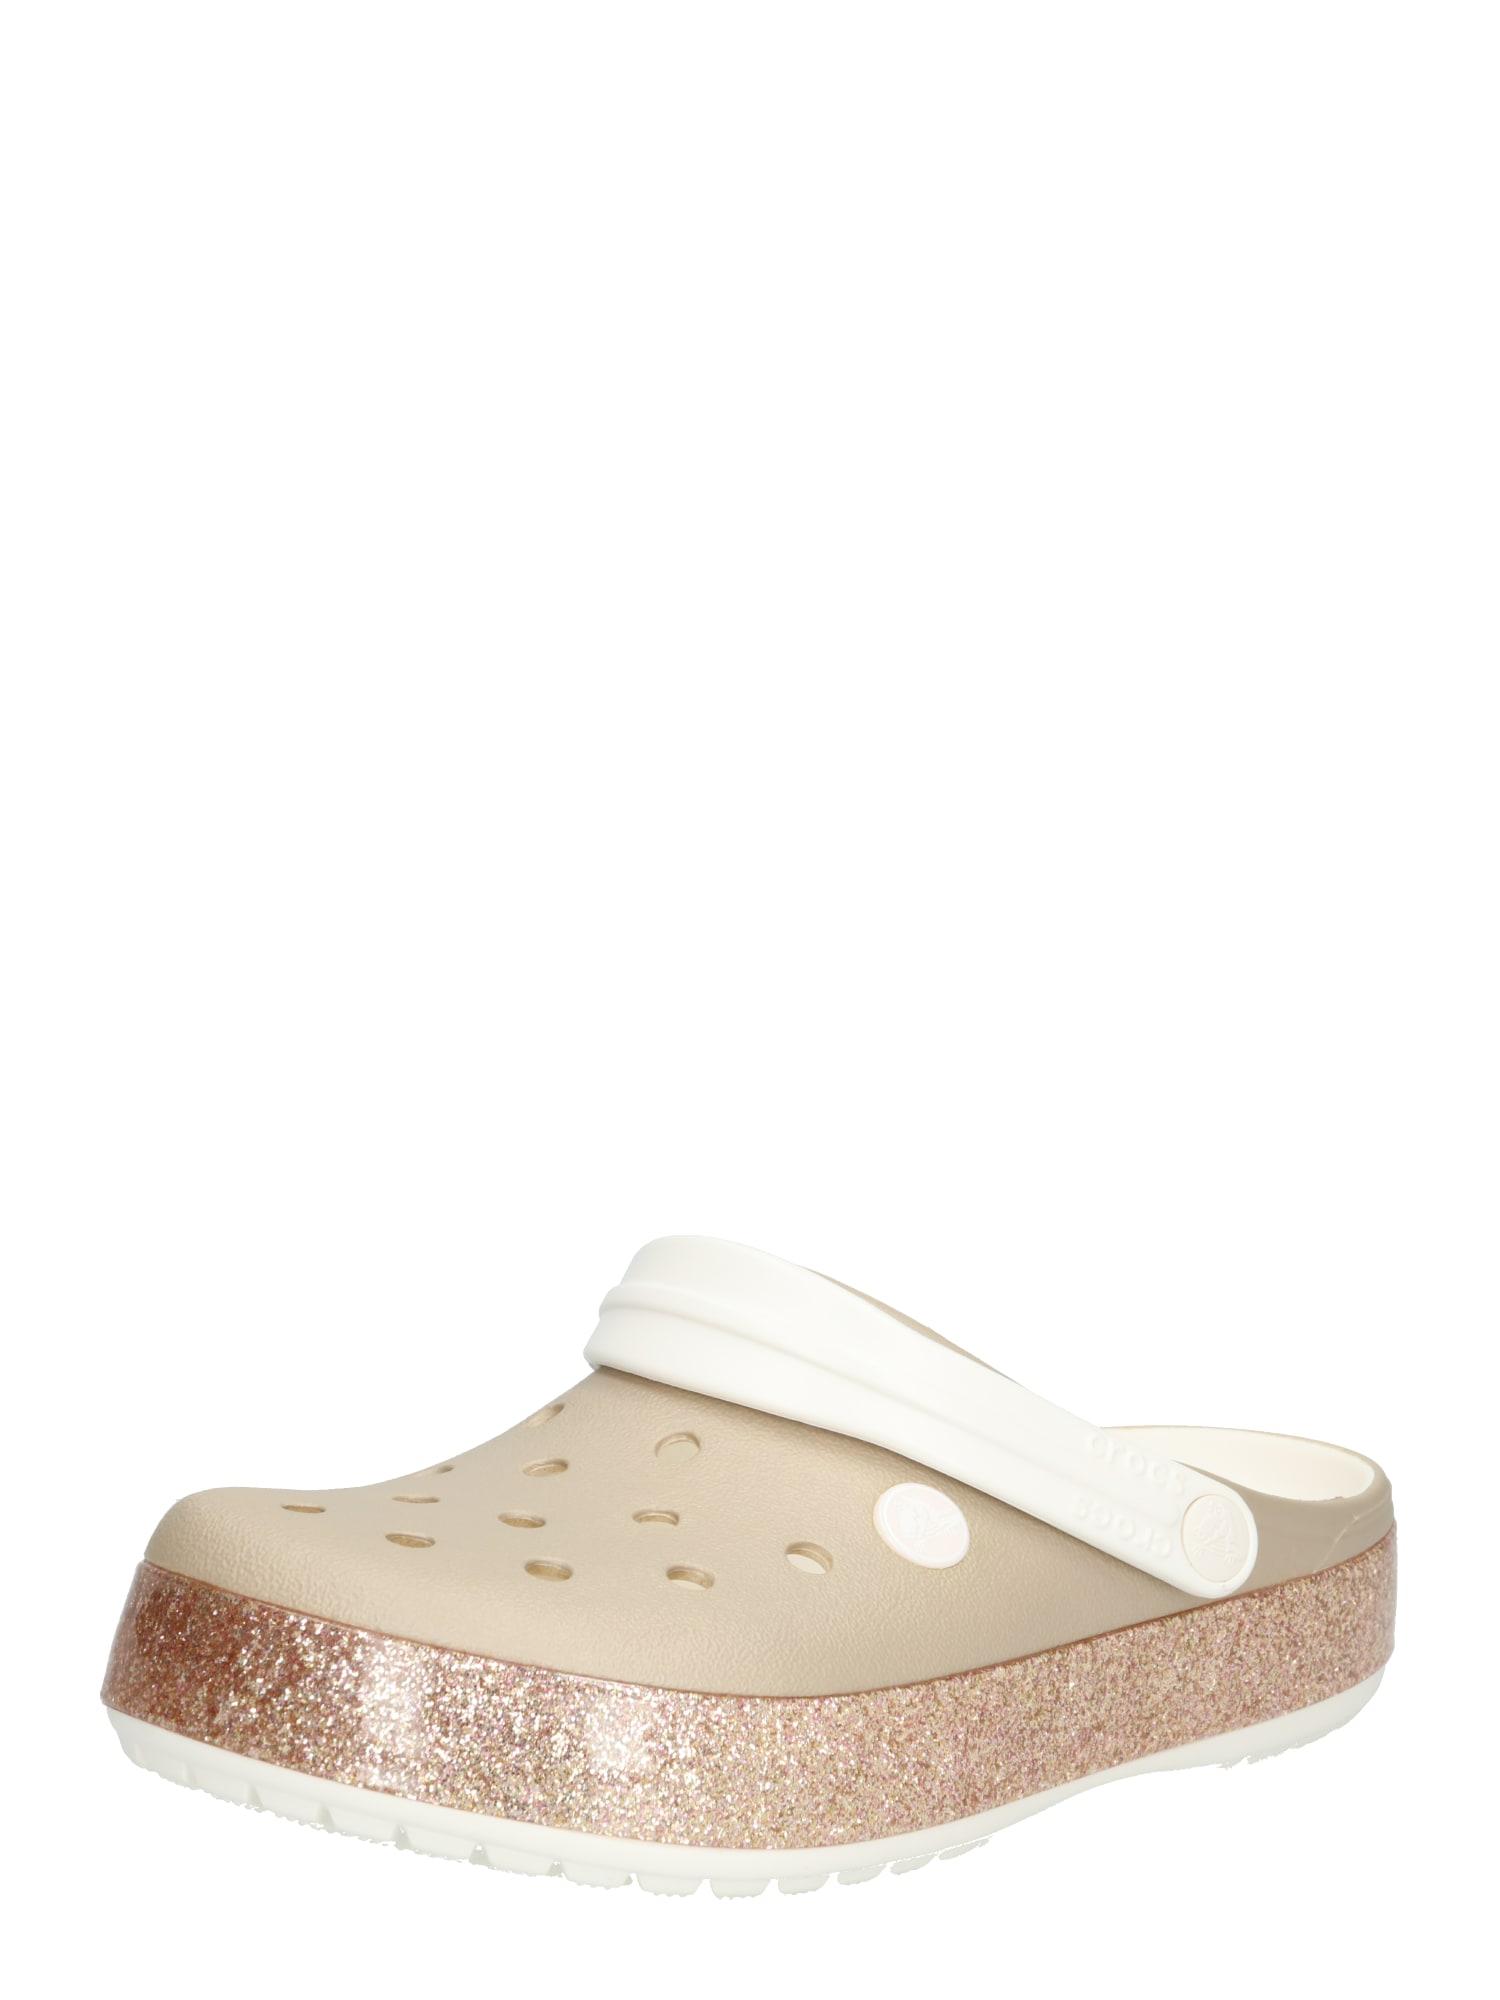 Pantofle Crocband Printed Clog champagne zlatá Crocs